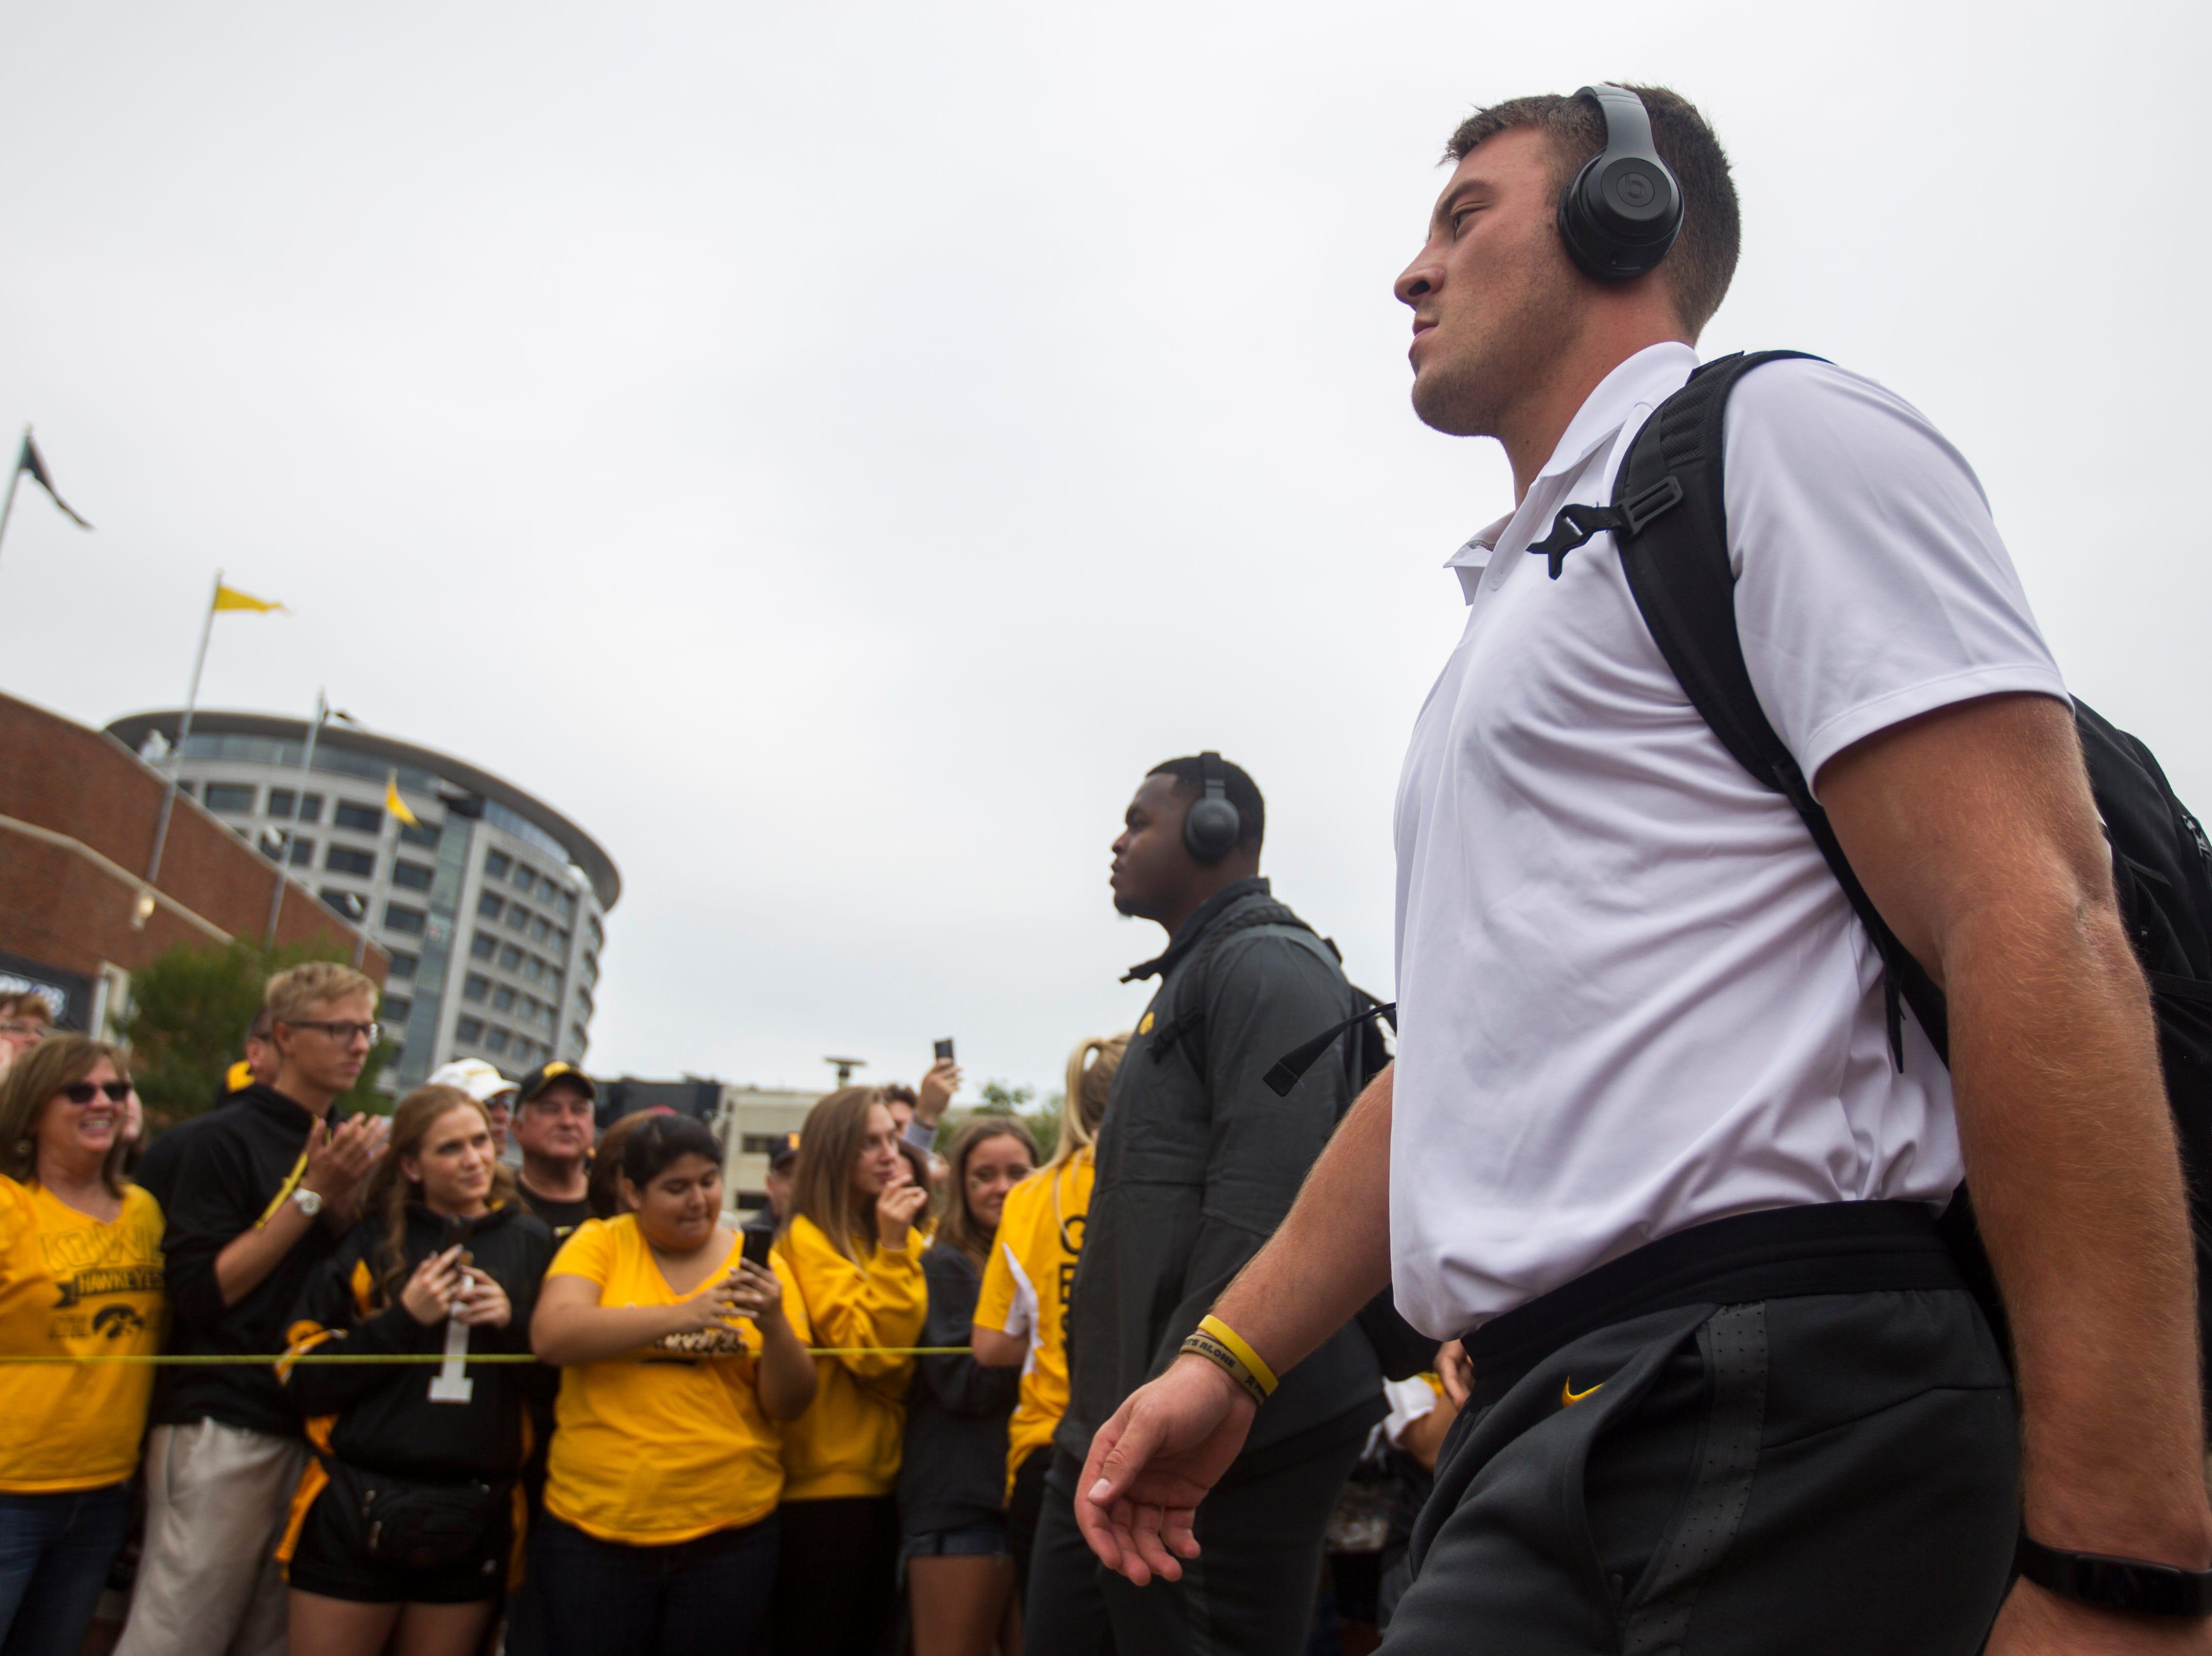 Iowa's Kristian Welch walks into the stadim before the Cy-Hawk NCAA football game on Saturday, Sept. 8, 2018, at Kinnick Stadium in Iowa City.